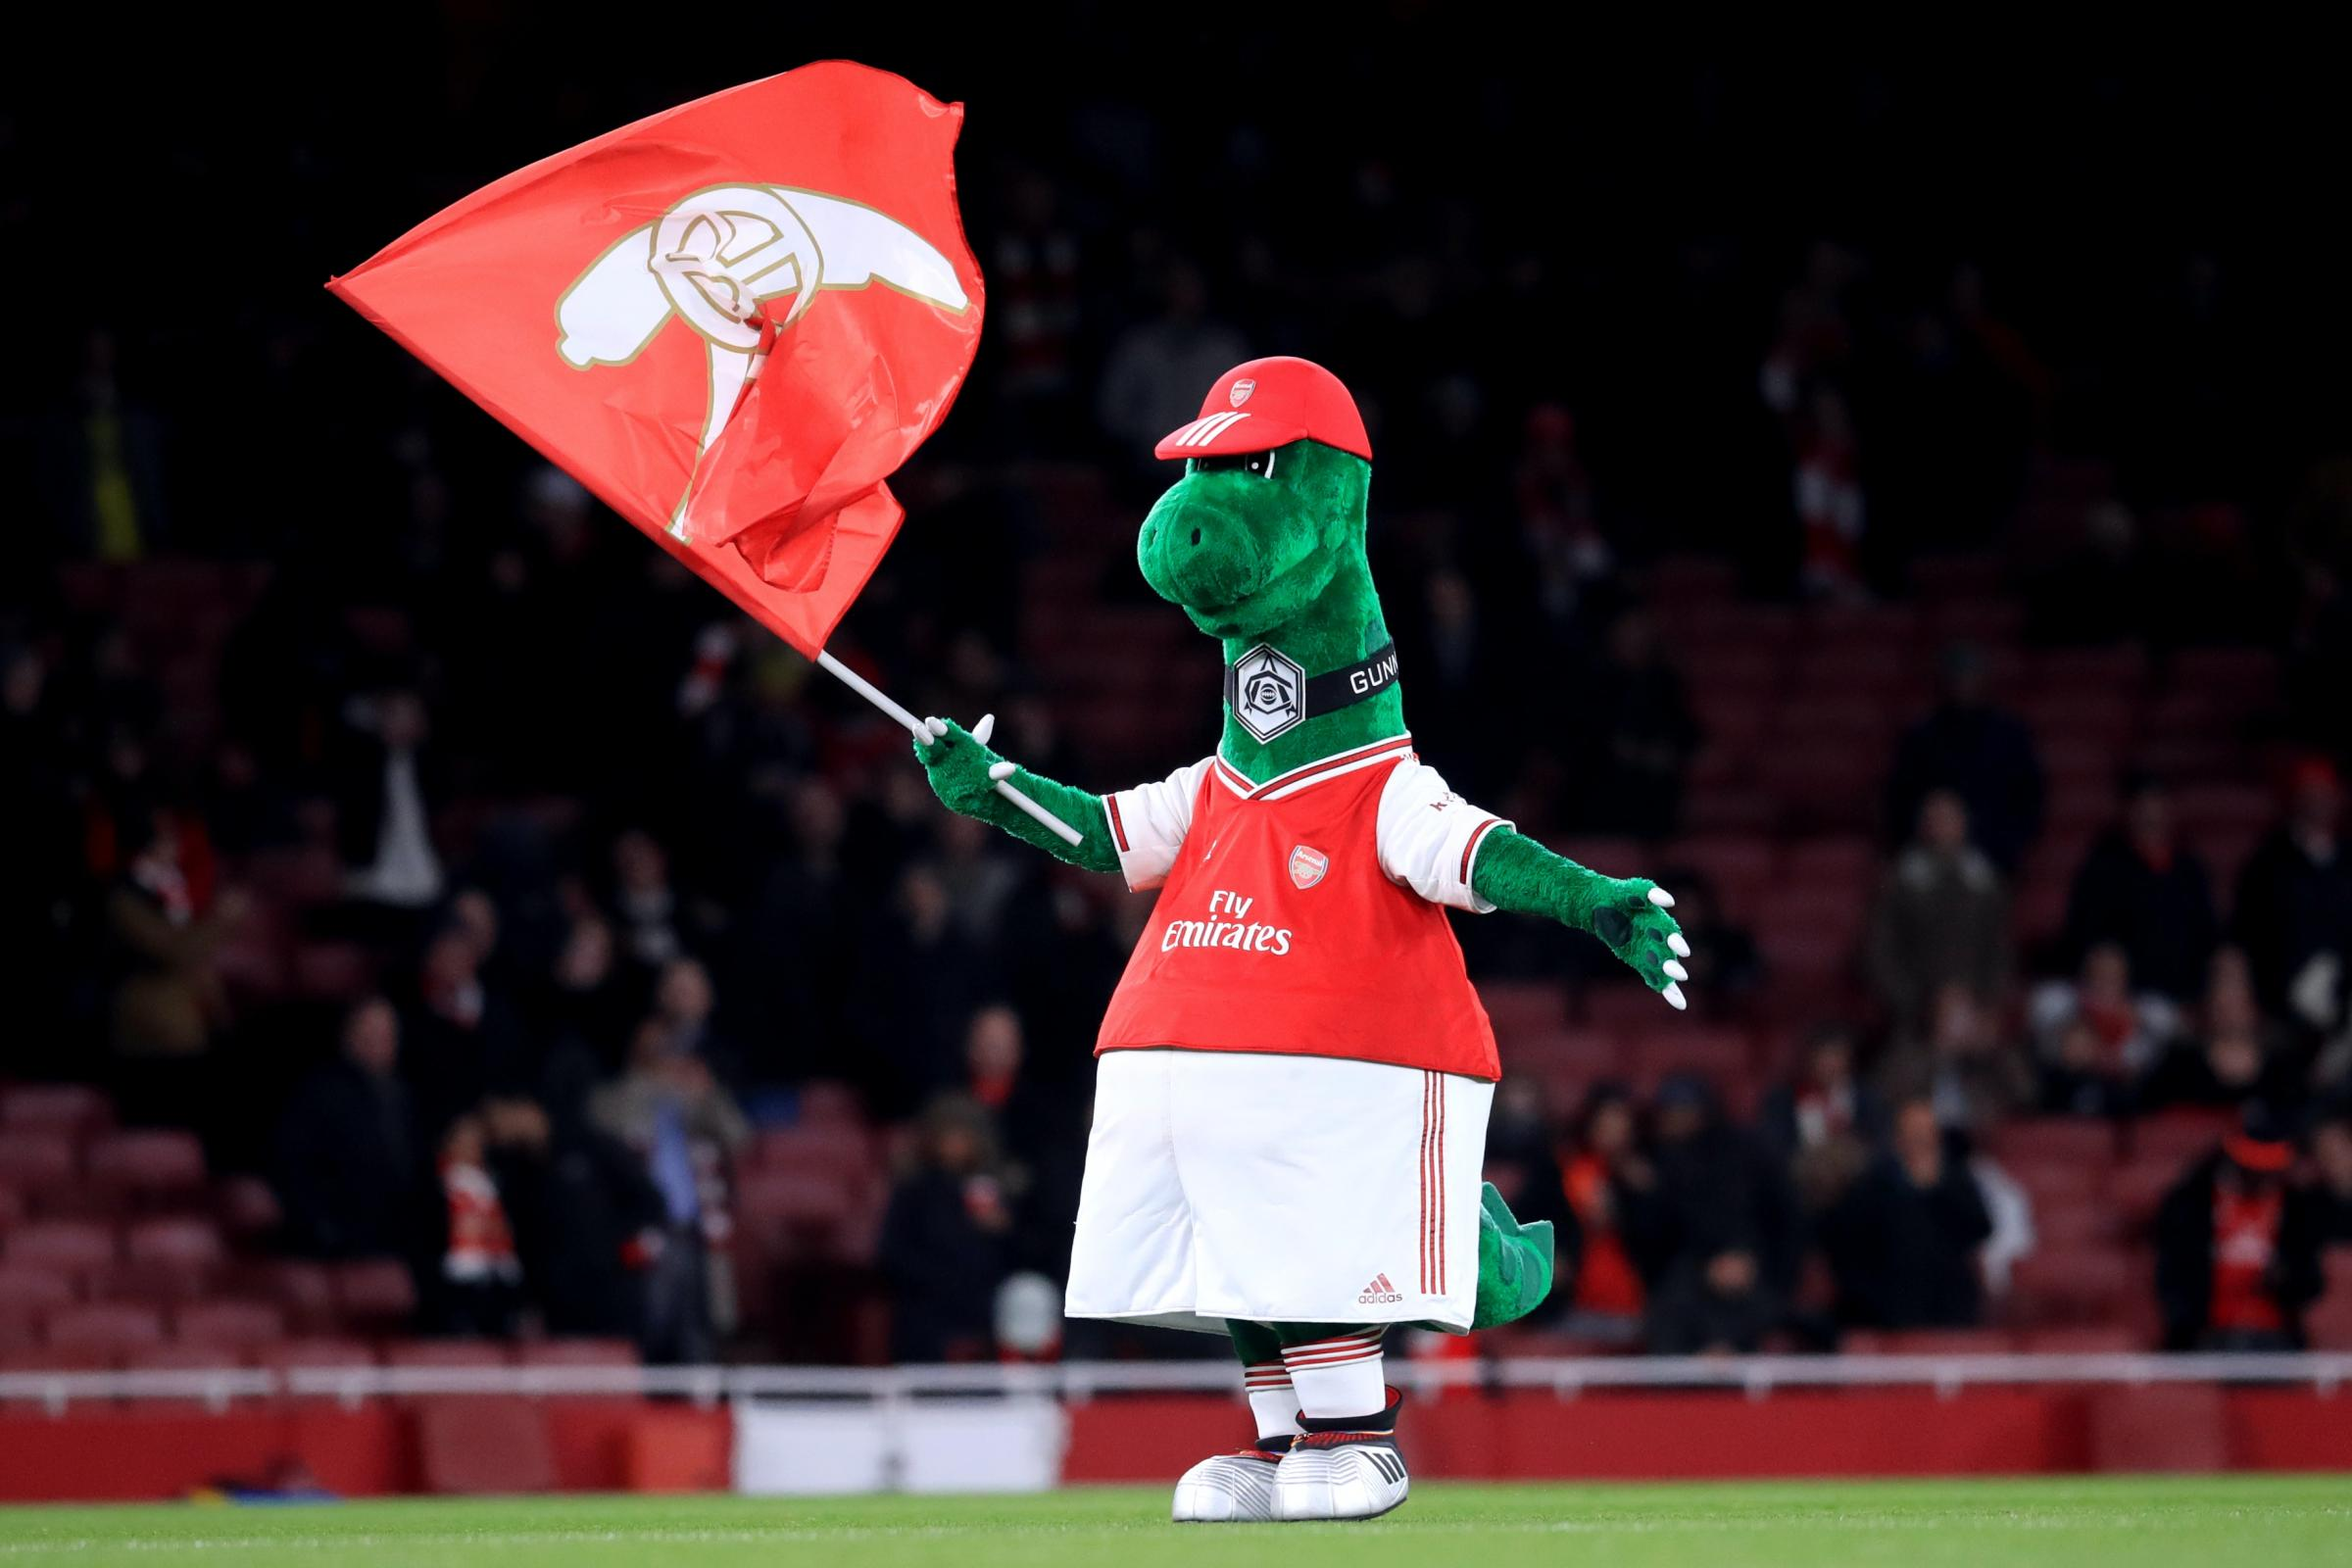 Gunnersaurus sacked! Arsenal's famous mascot victim of cost cutting